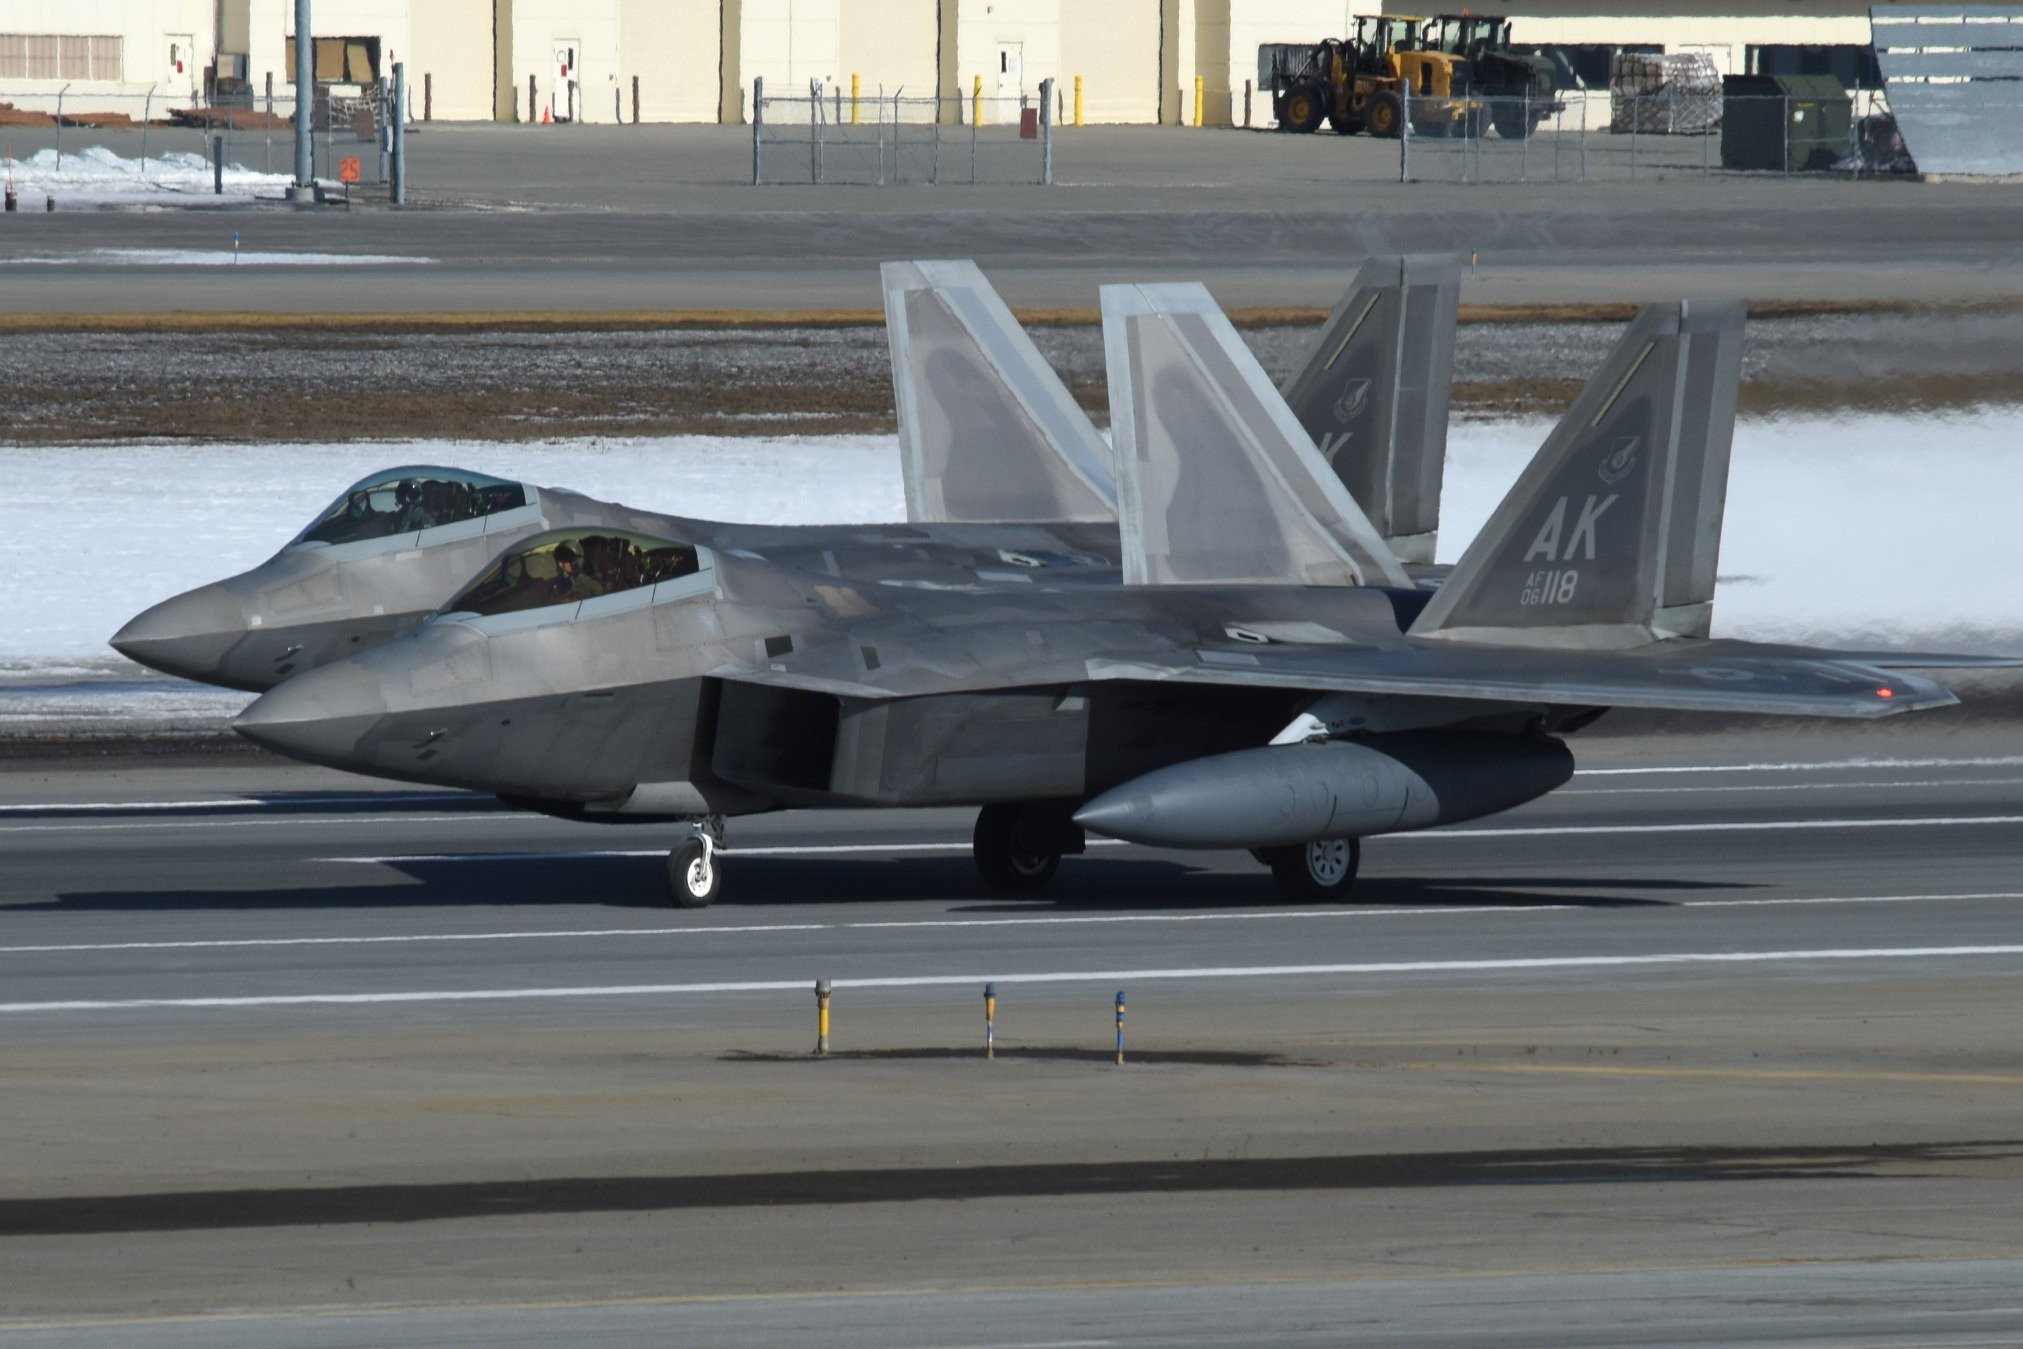 F-22,戰機,演習,太平洋鋼鐵-2021,F-35,飛彈,制空權